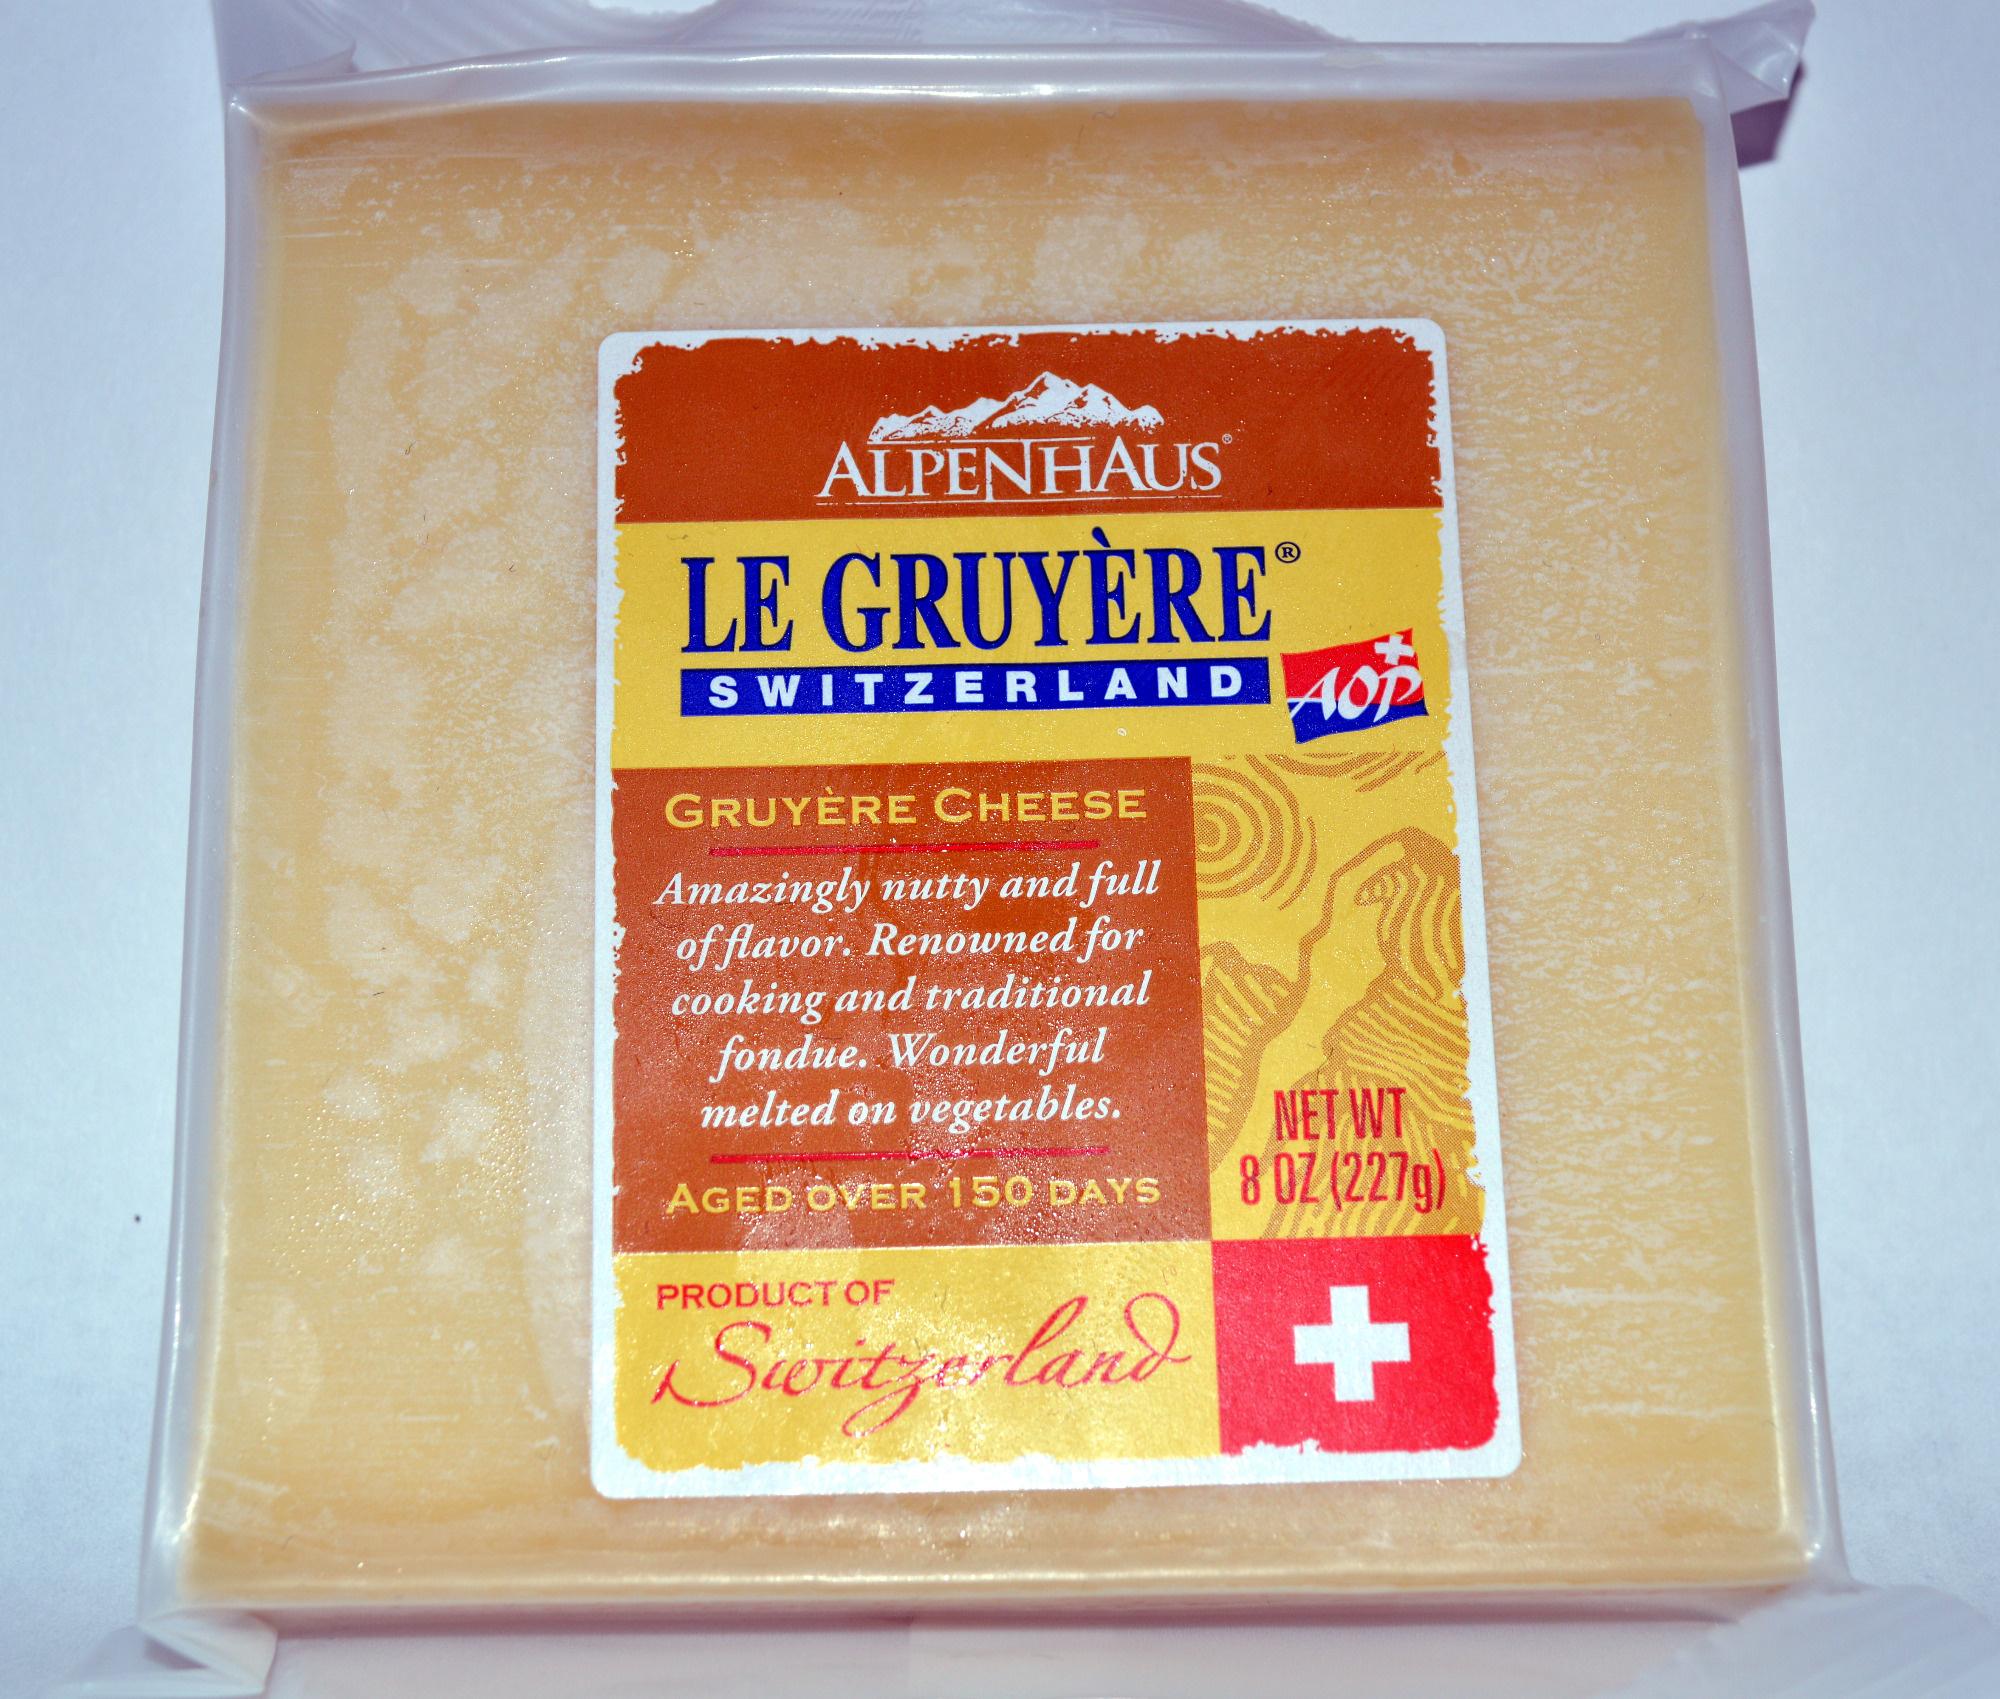 Alpenhaus, le gruyere switzerland + aop, gruyere cheese - Product - en